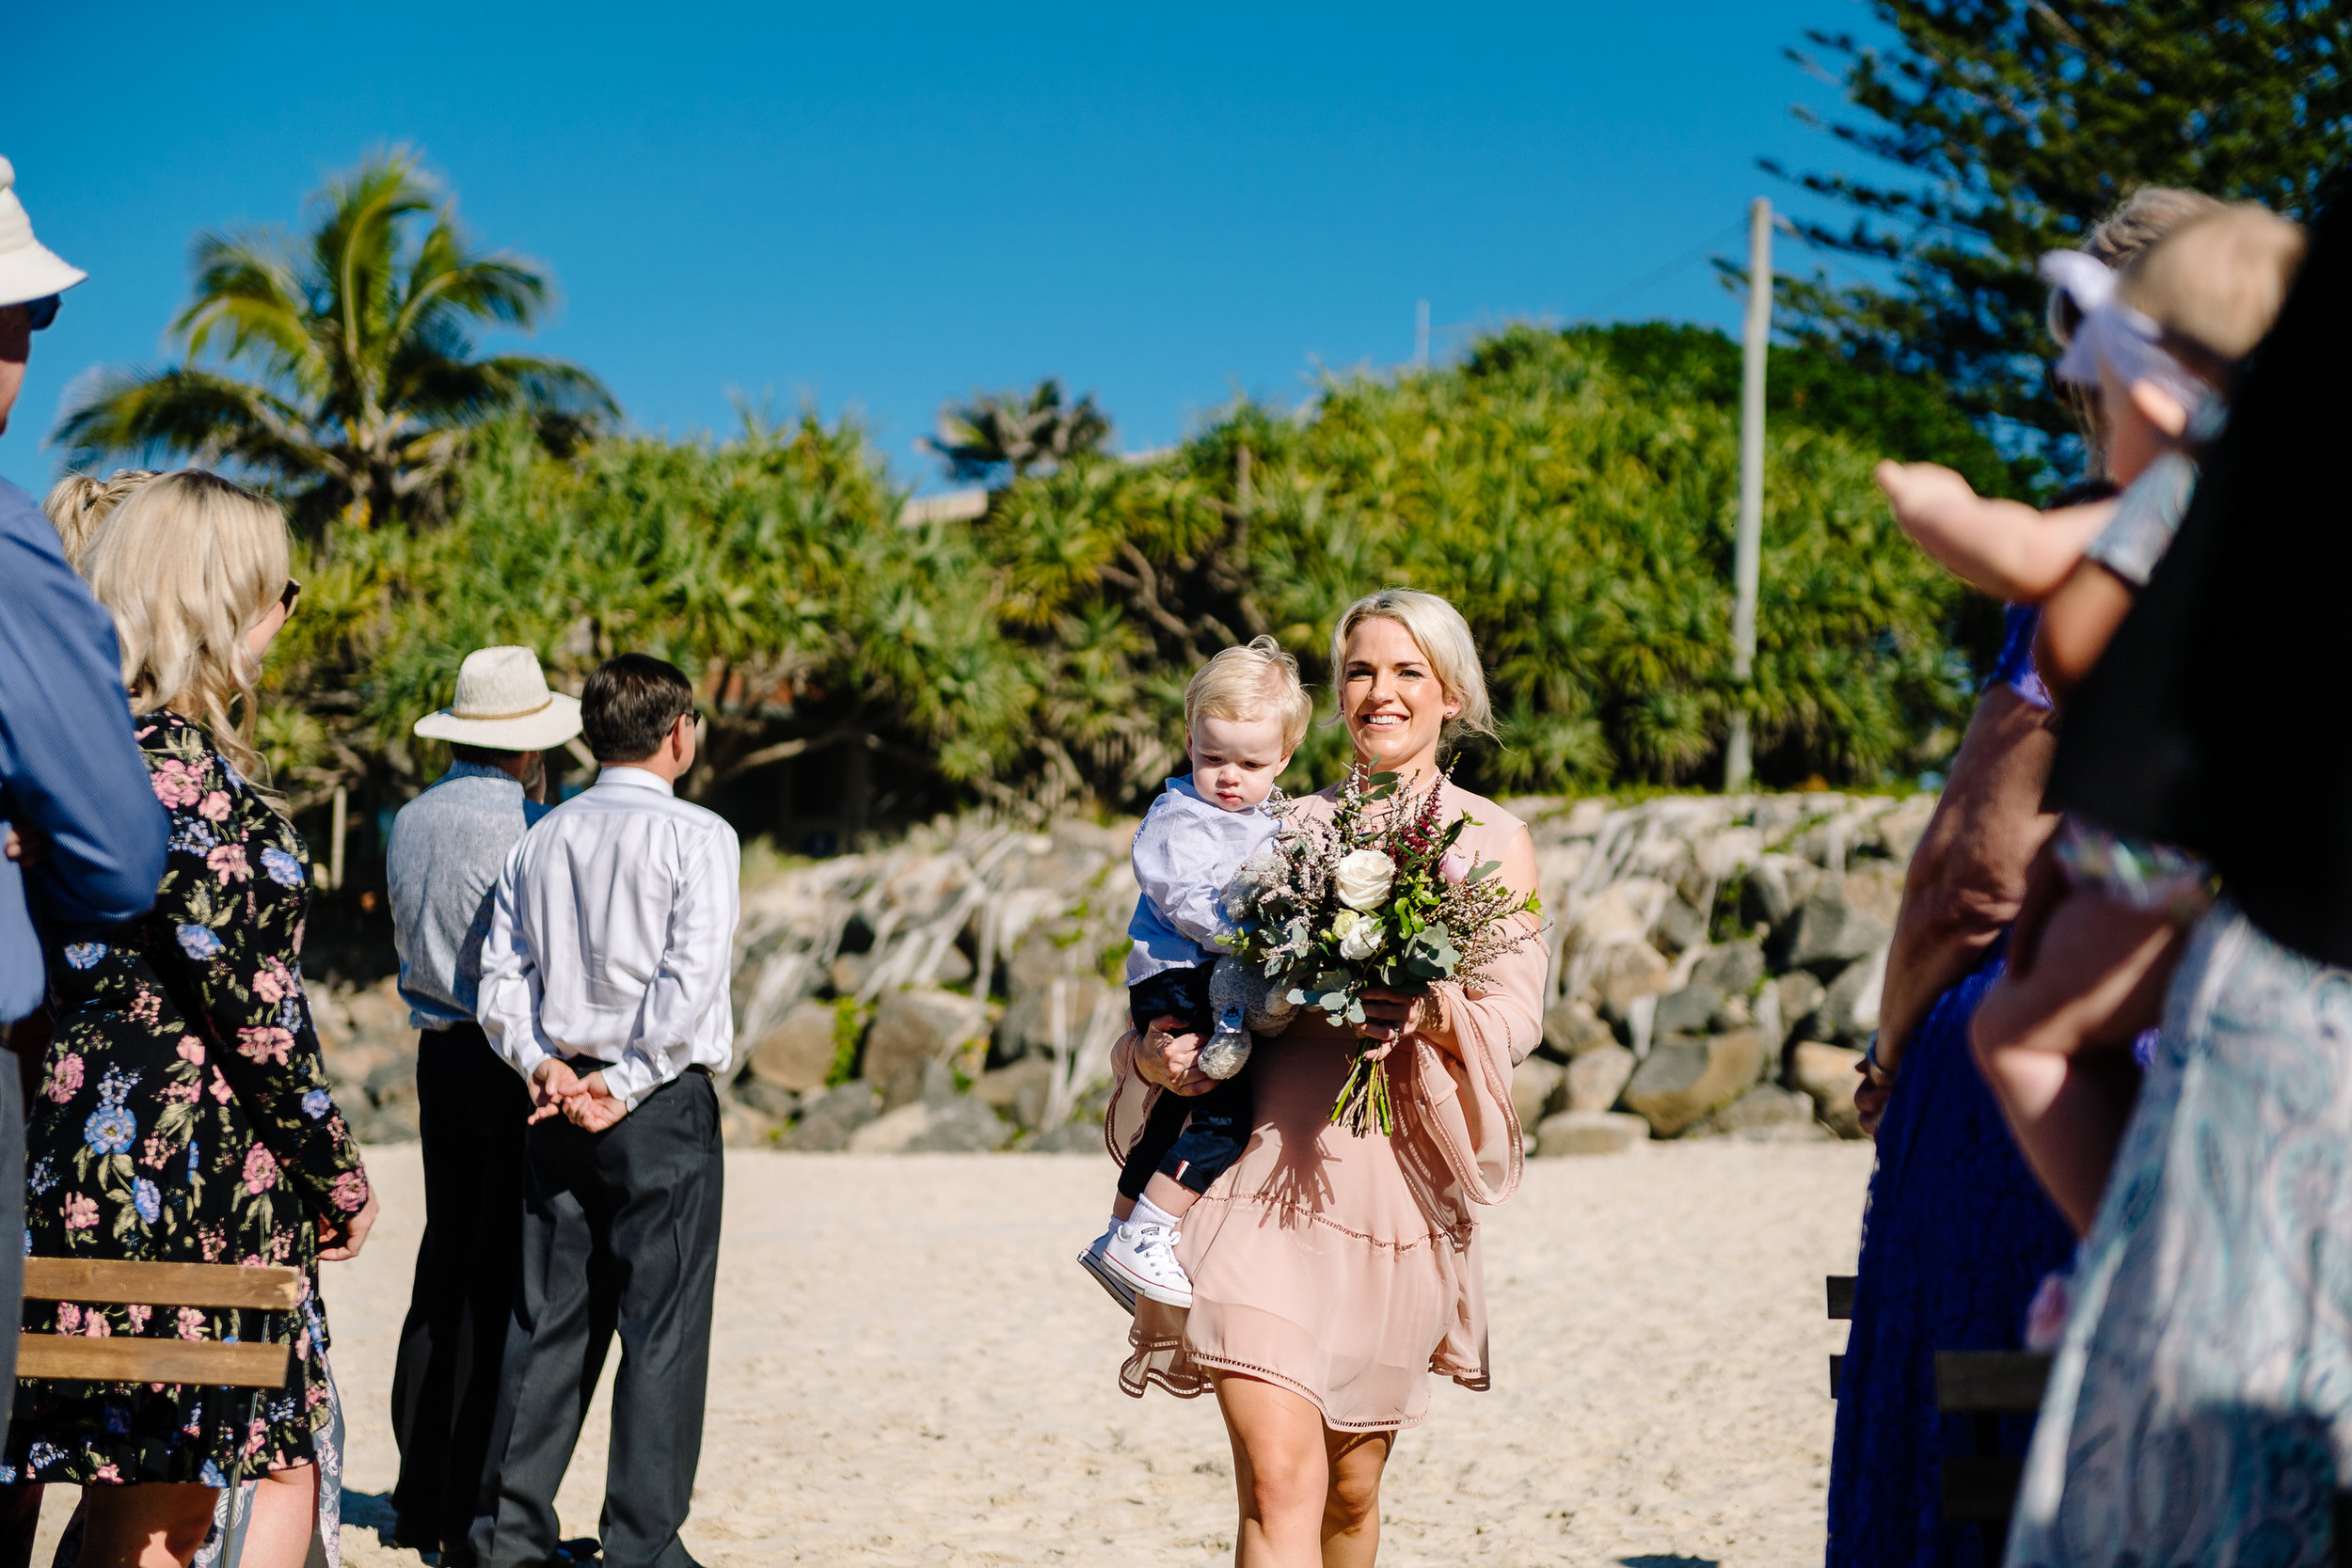 Justin_And_Jim_Photography_Byron_Bay_Wedding036.JPG